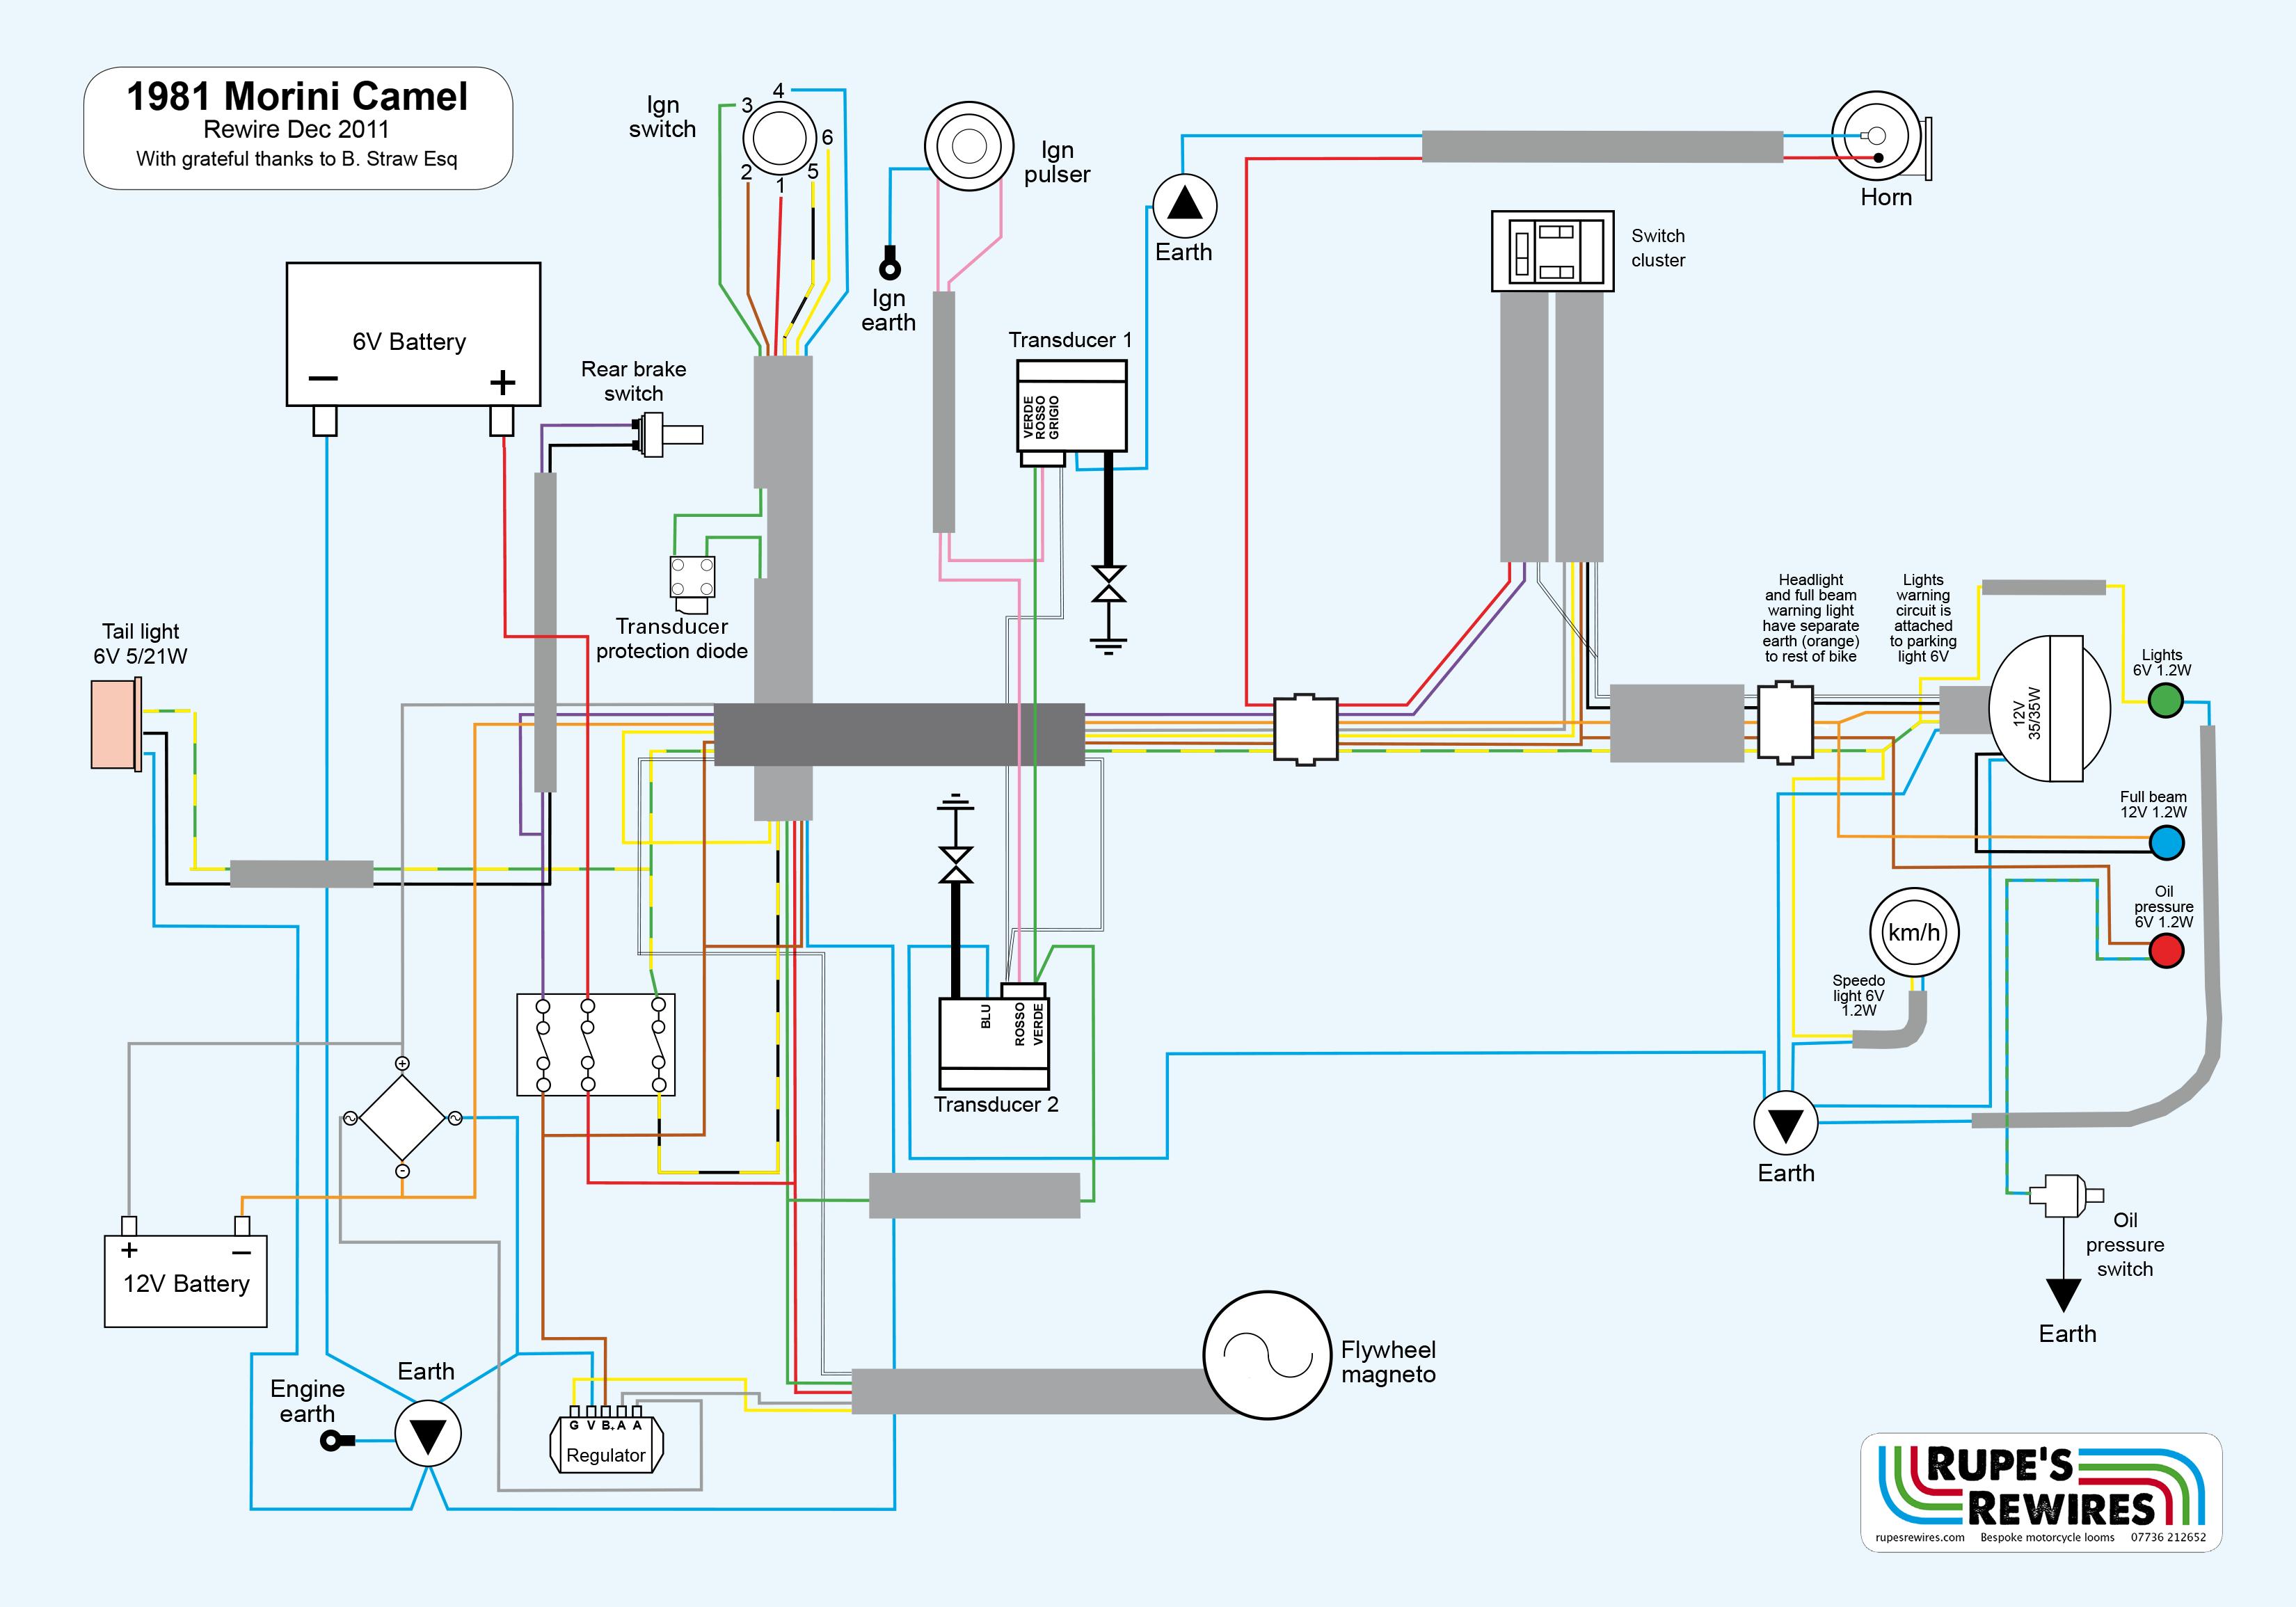 1981 morini 500 camel wiring diagram full size image